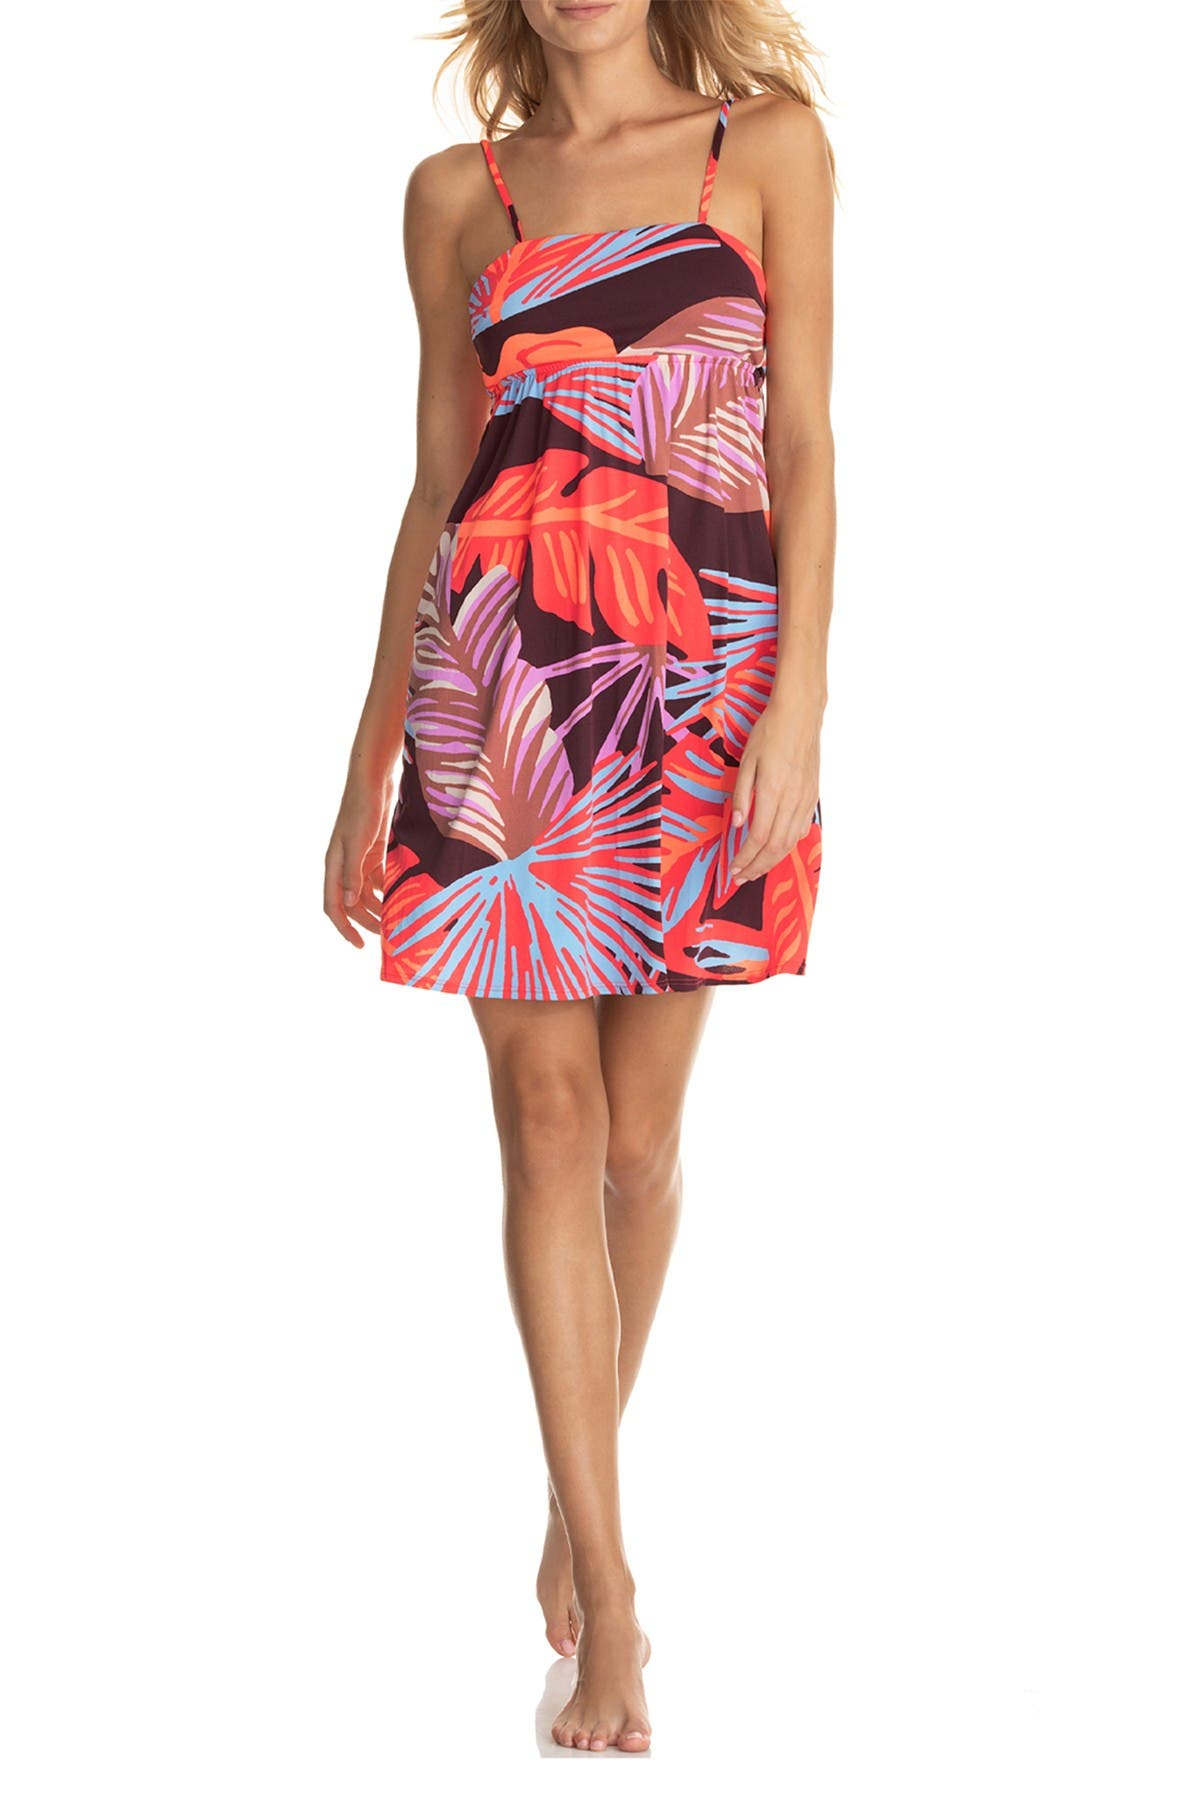 Image of Maaji Fairy Dust Cover-Up Mini Dress